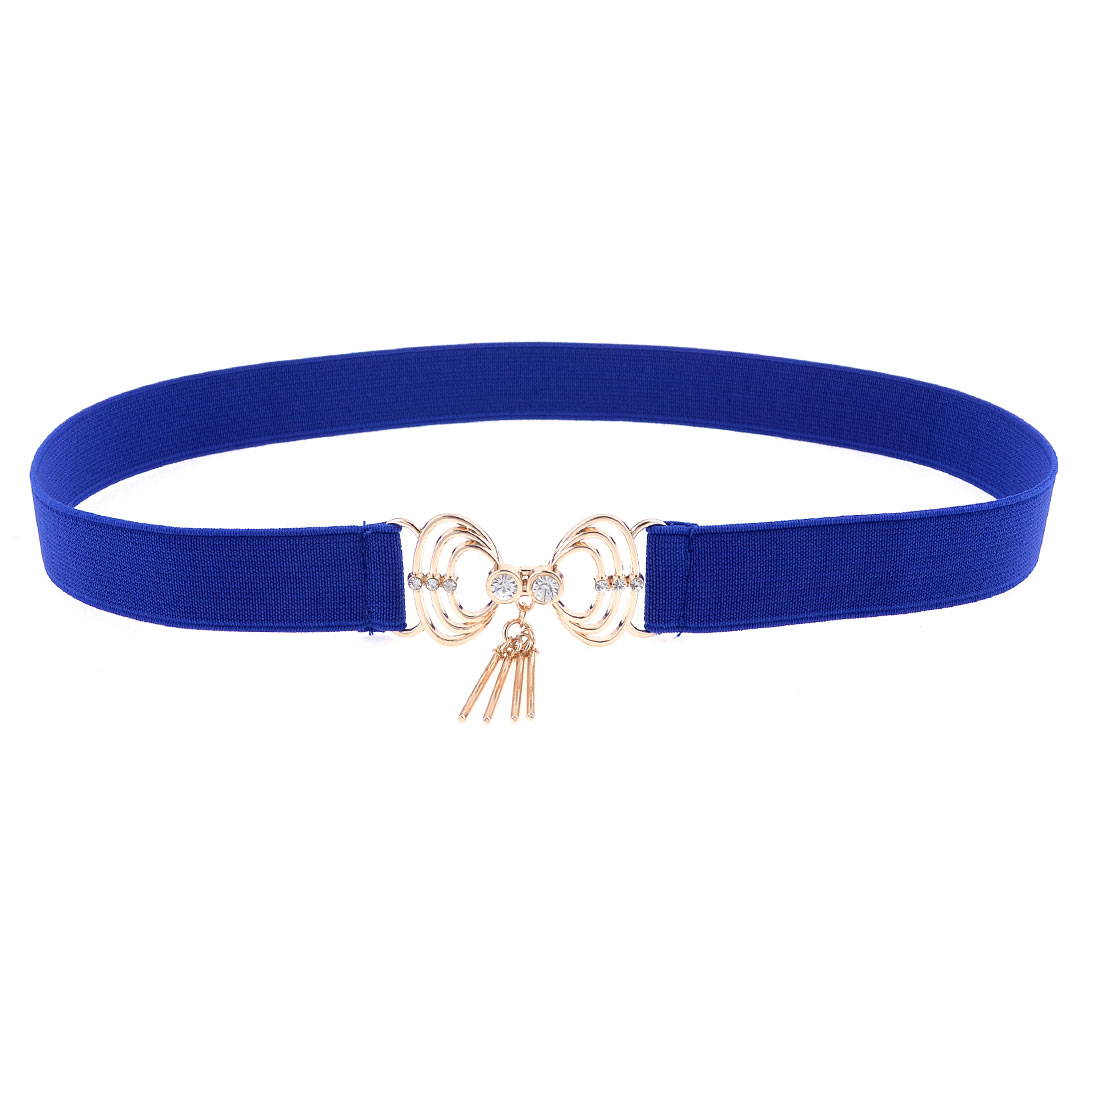 Lady Shell Shape Gold Tone Interlock Buckle Blue Elastic Cinch Belt